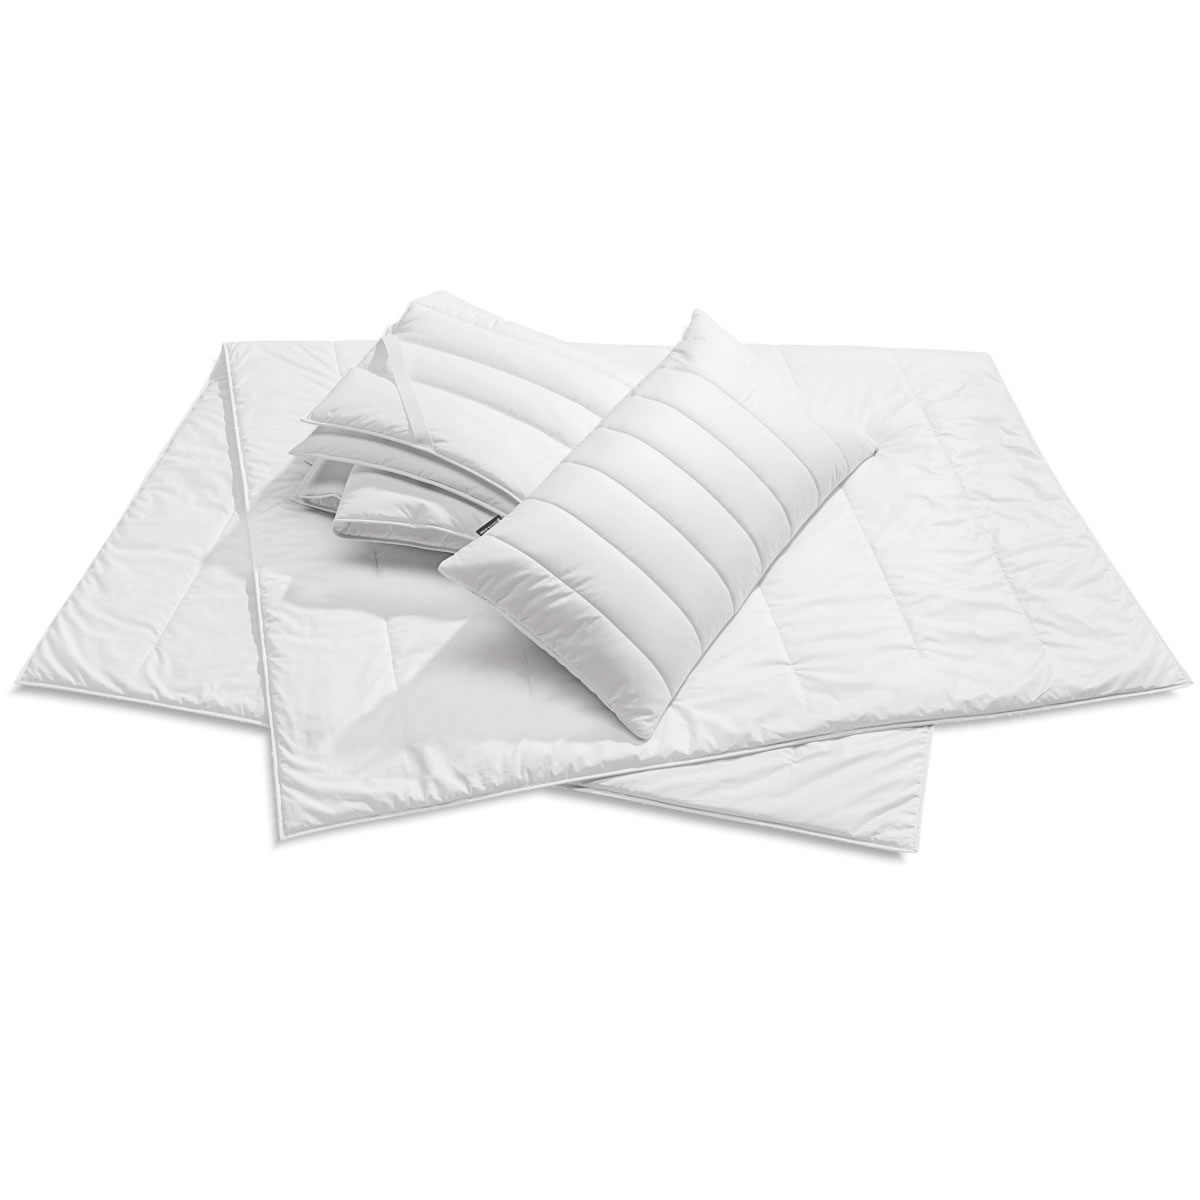 centa star allergo protect unterbett in 90x200 cm auflage. Black Bedroom Furniture Sets. Home Design Ideas